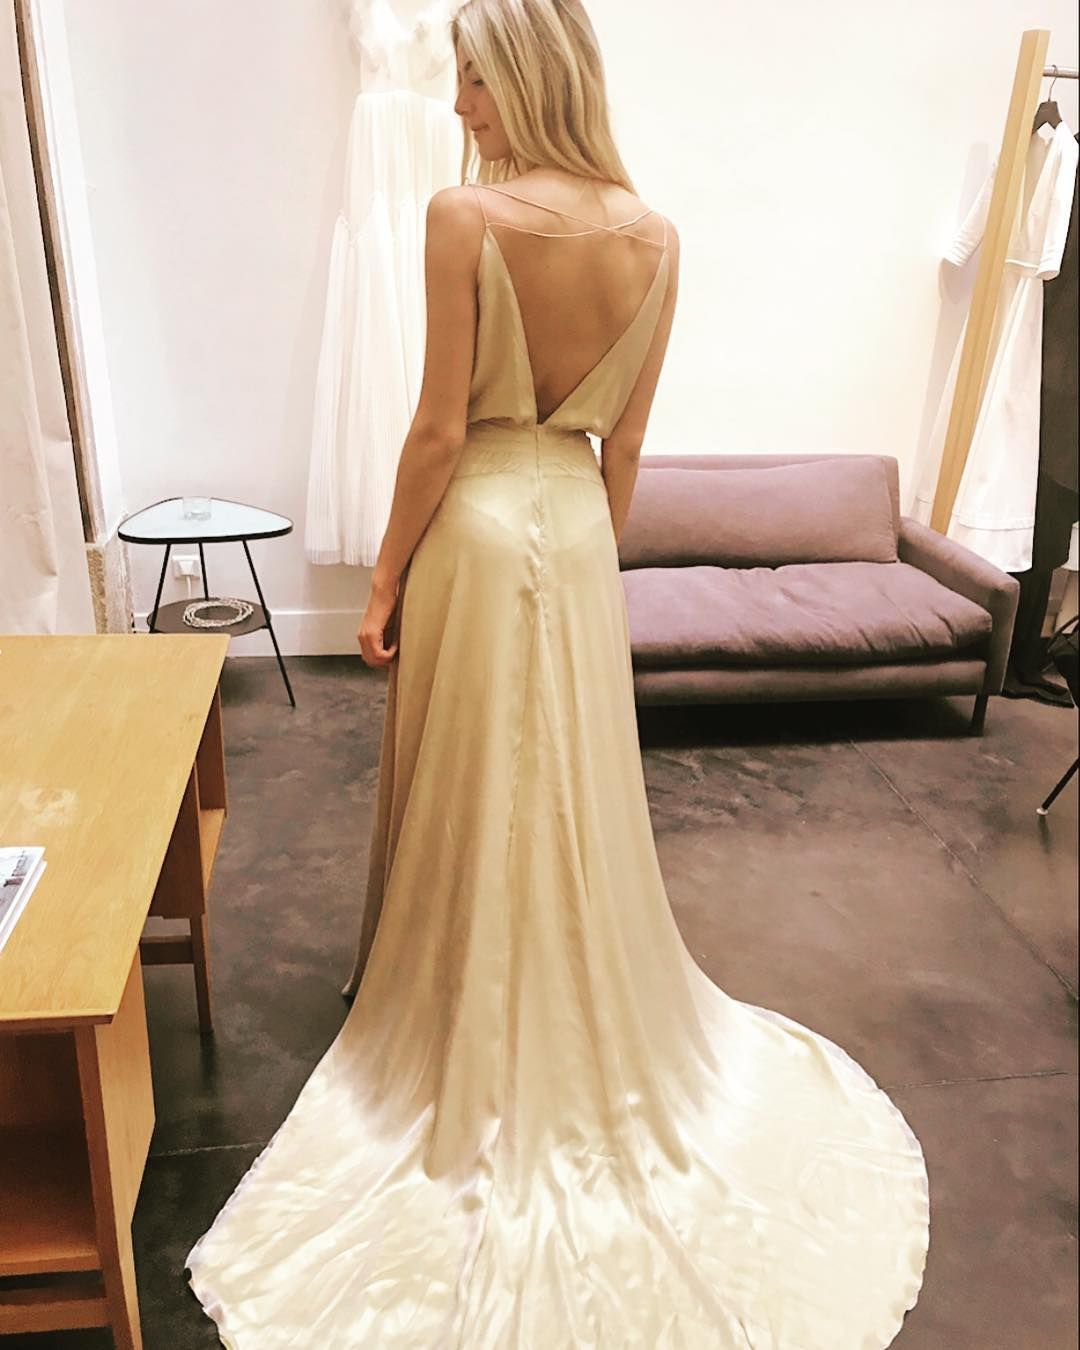 Delphine Manivet On Instagram New Collection Lazlo Dress Delphinemanivet Gold Weddingdress Wedding Dresses Dresses Backless Dress [ 1350 x 1080 Pixel ]